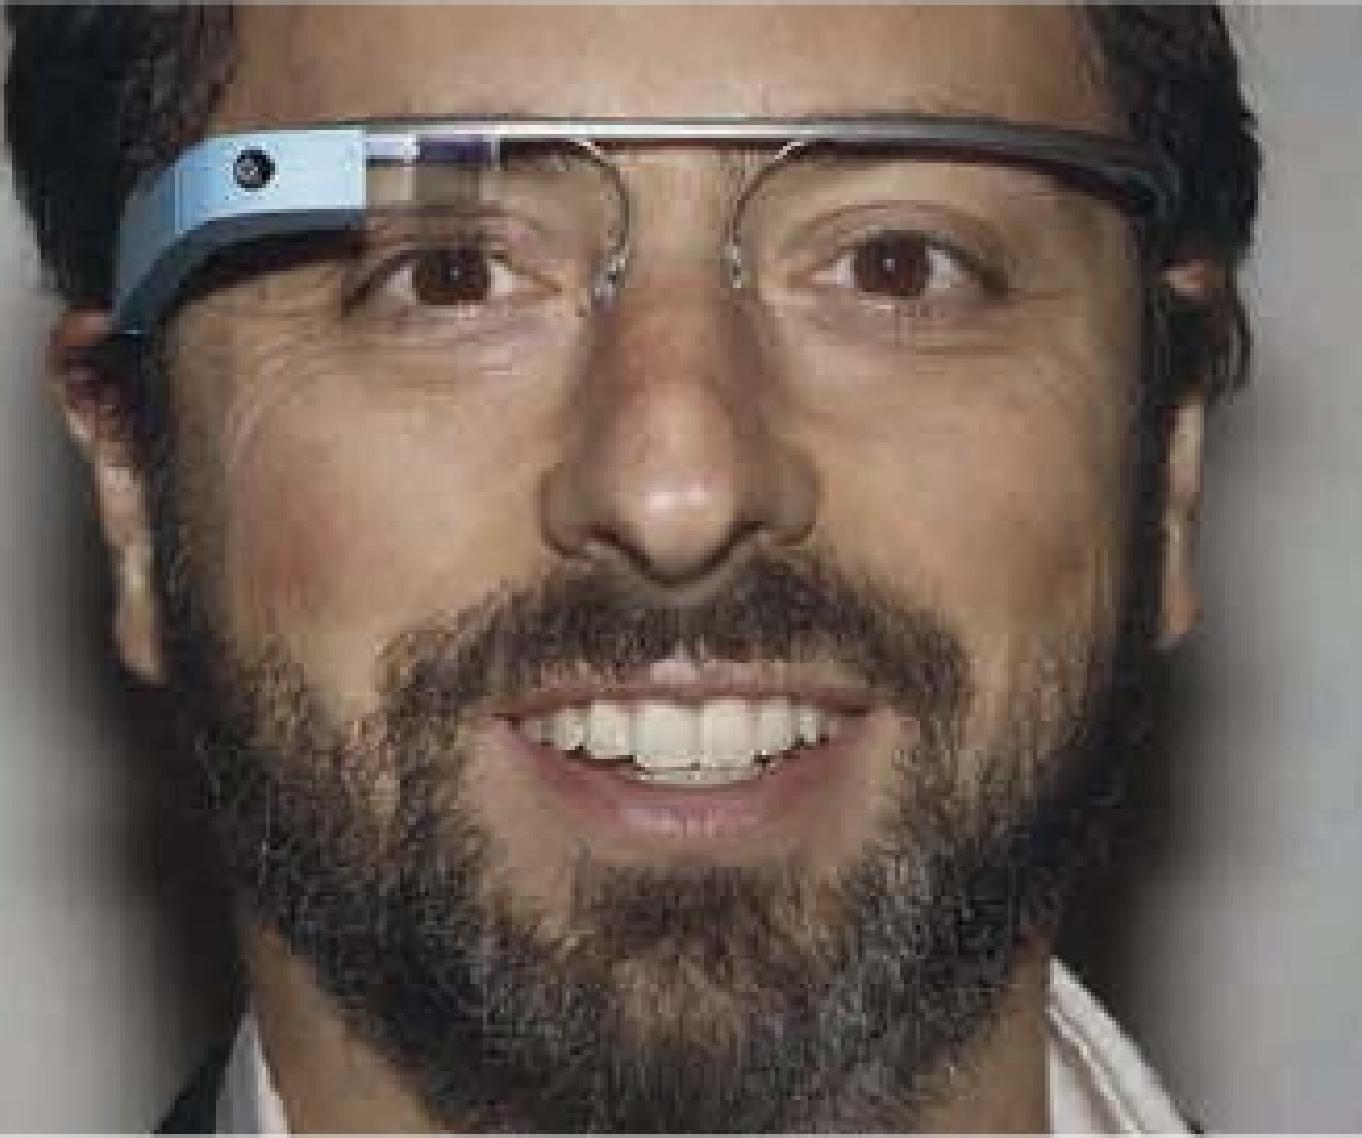 http://pc-urgence.com/actus/wp-content/uploads/2013/google-glass/googleglass_Picture2.jpg